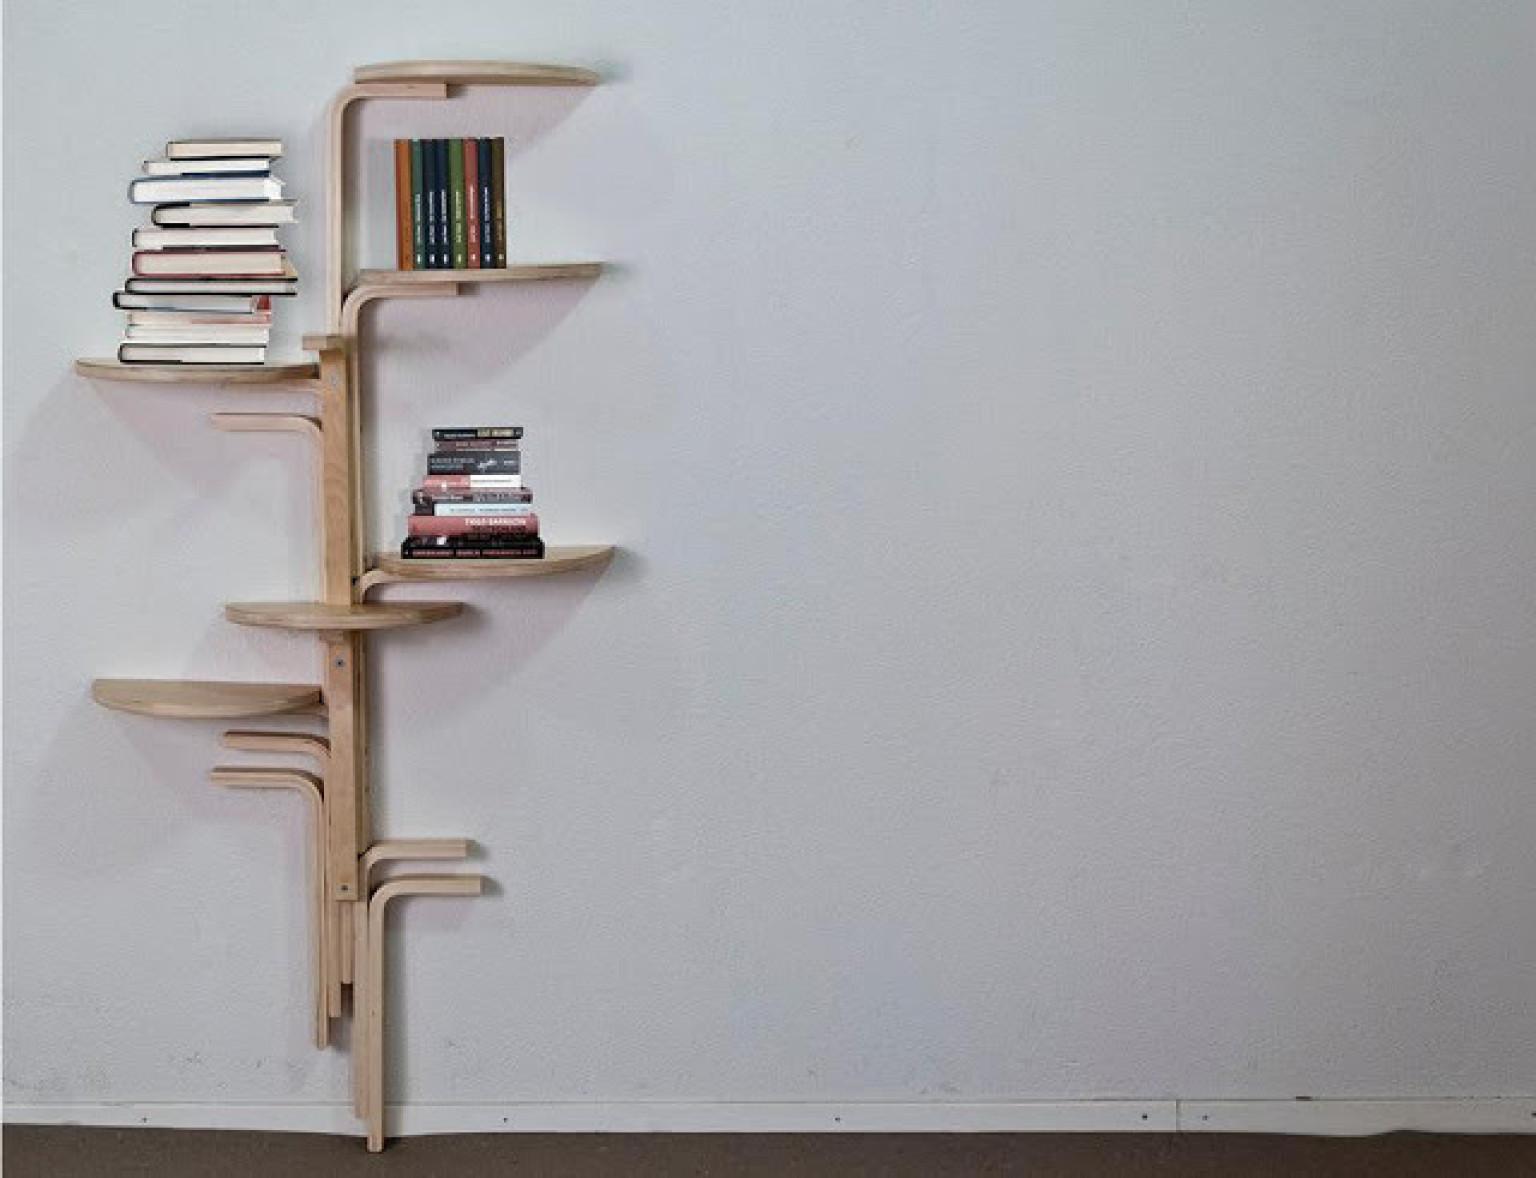 ikea hackers trucos para reinventar sus muebles fotos. Black Bedroom Furniture Sets. Home Design Ideas